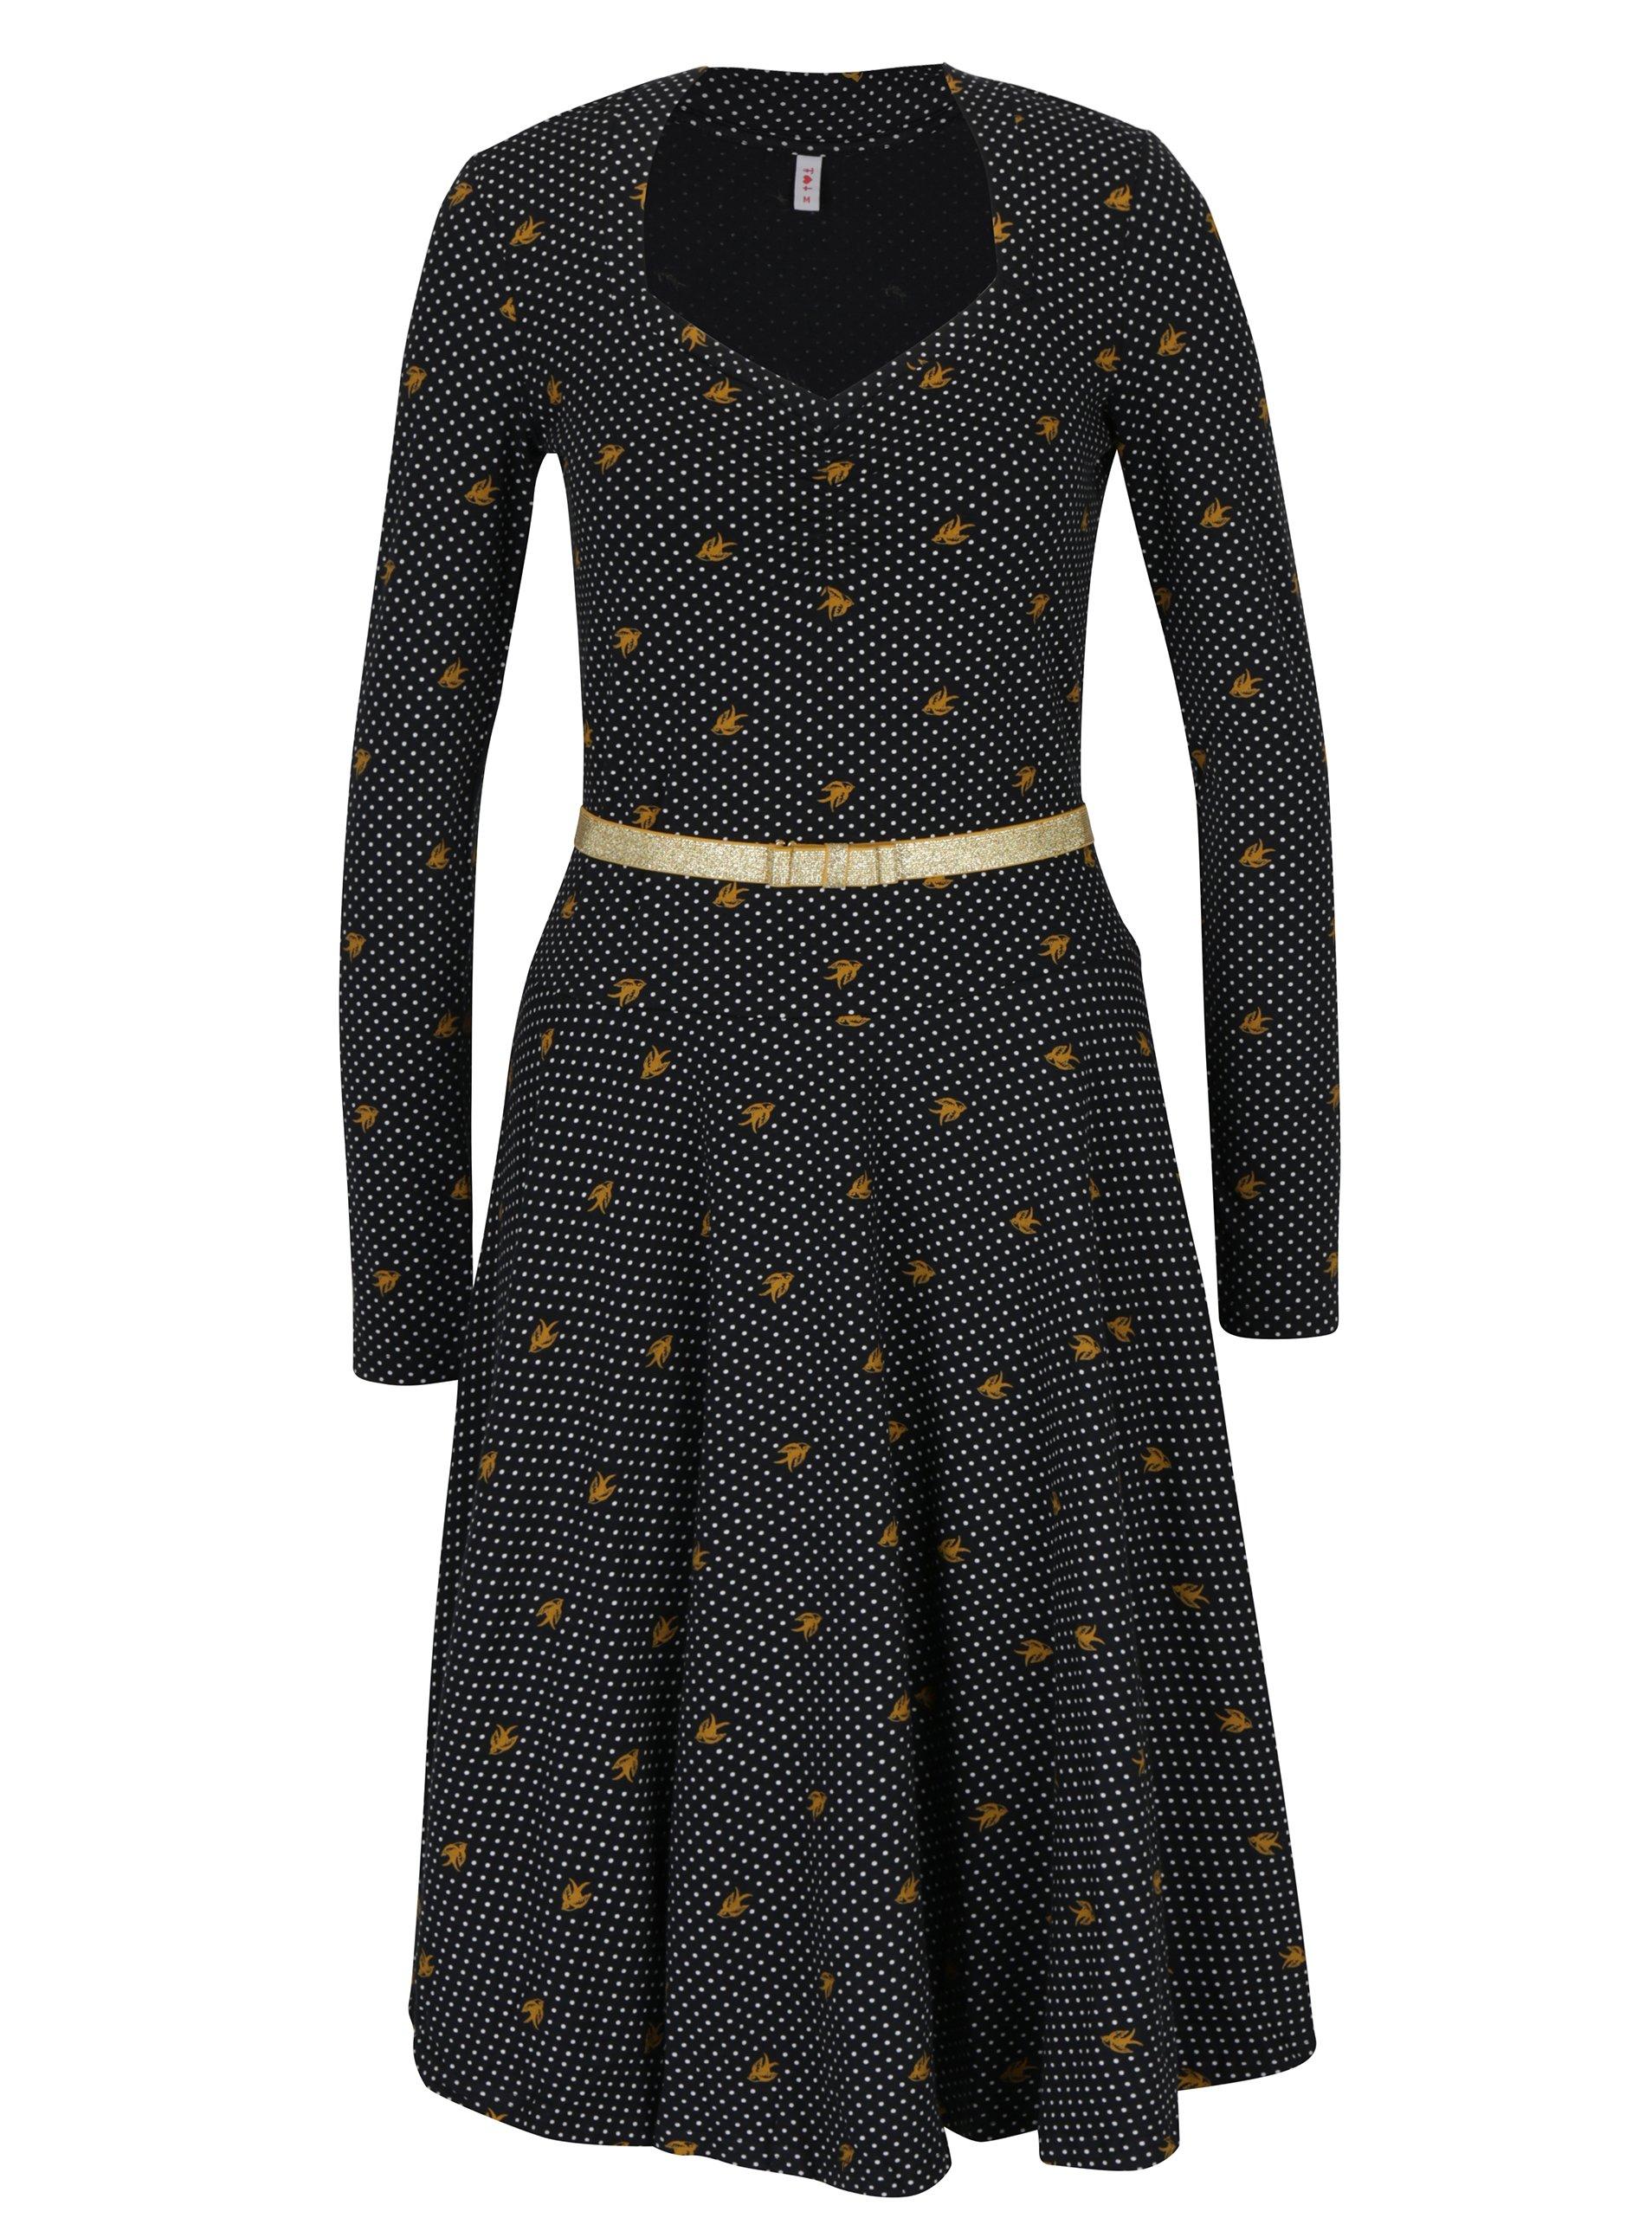 Černé vzorované šaty s dlouhým rukávem Blutsgeschwister